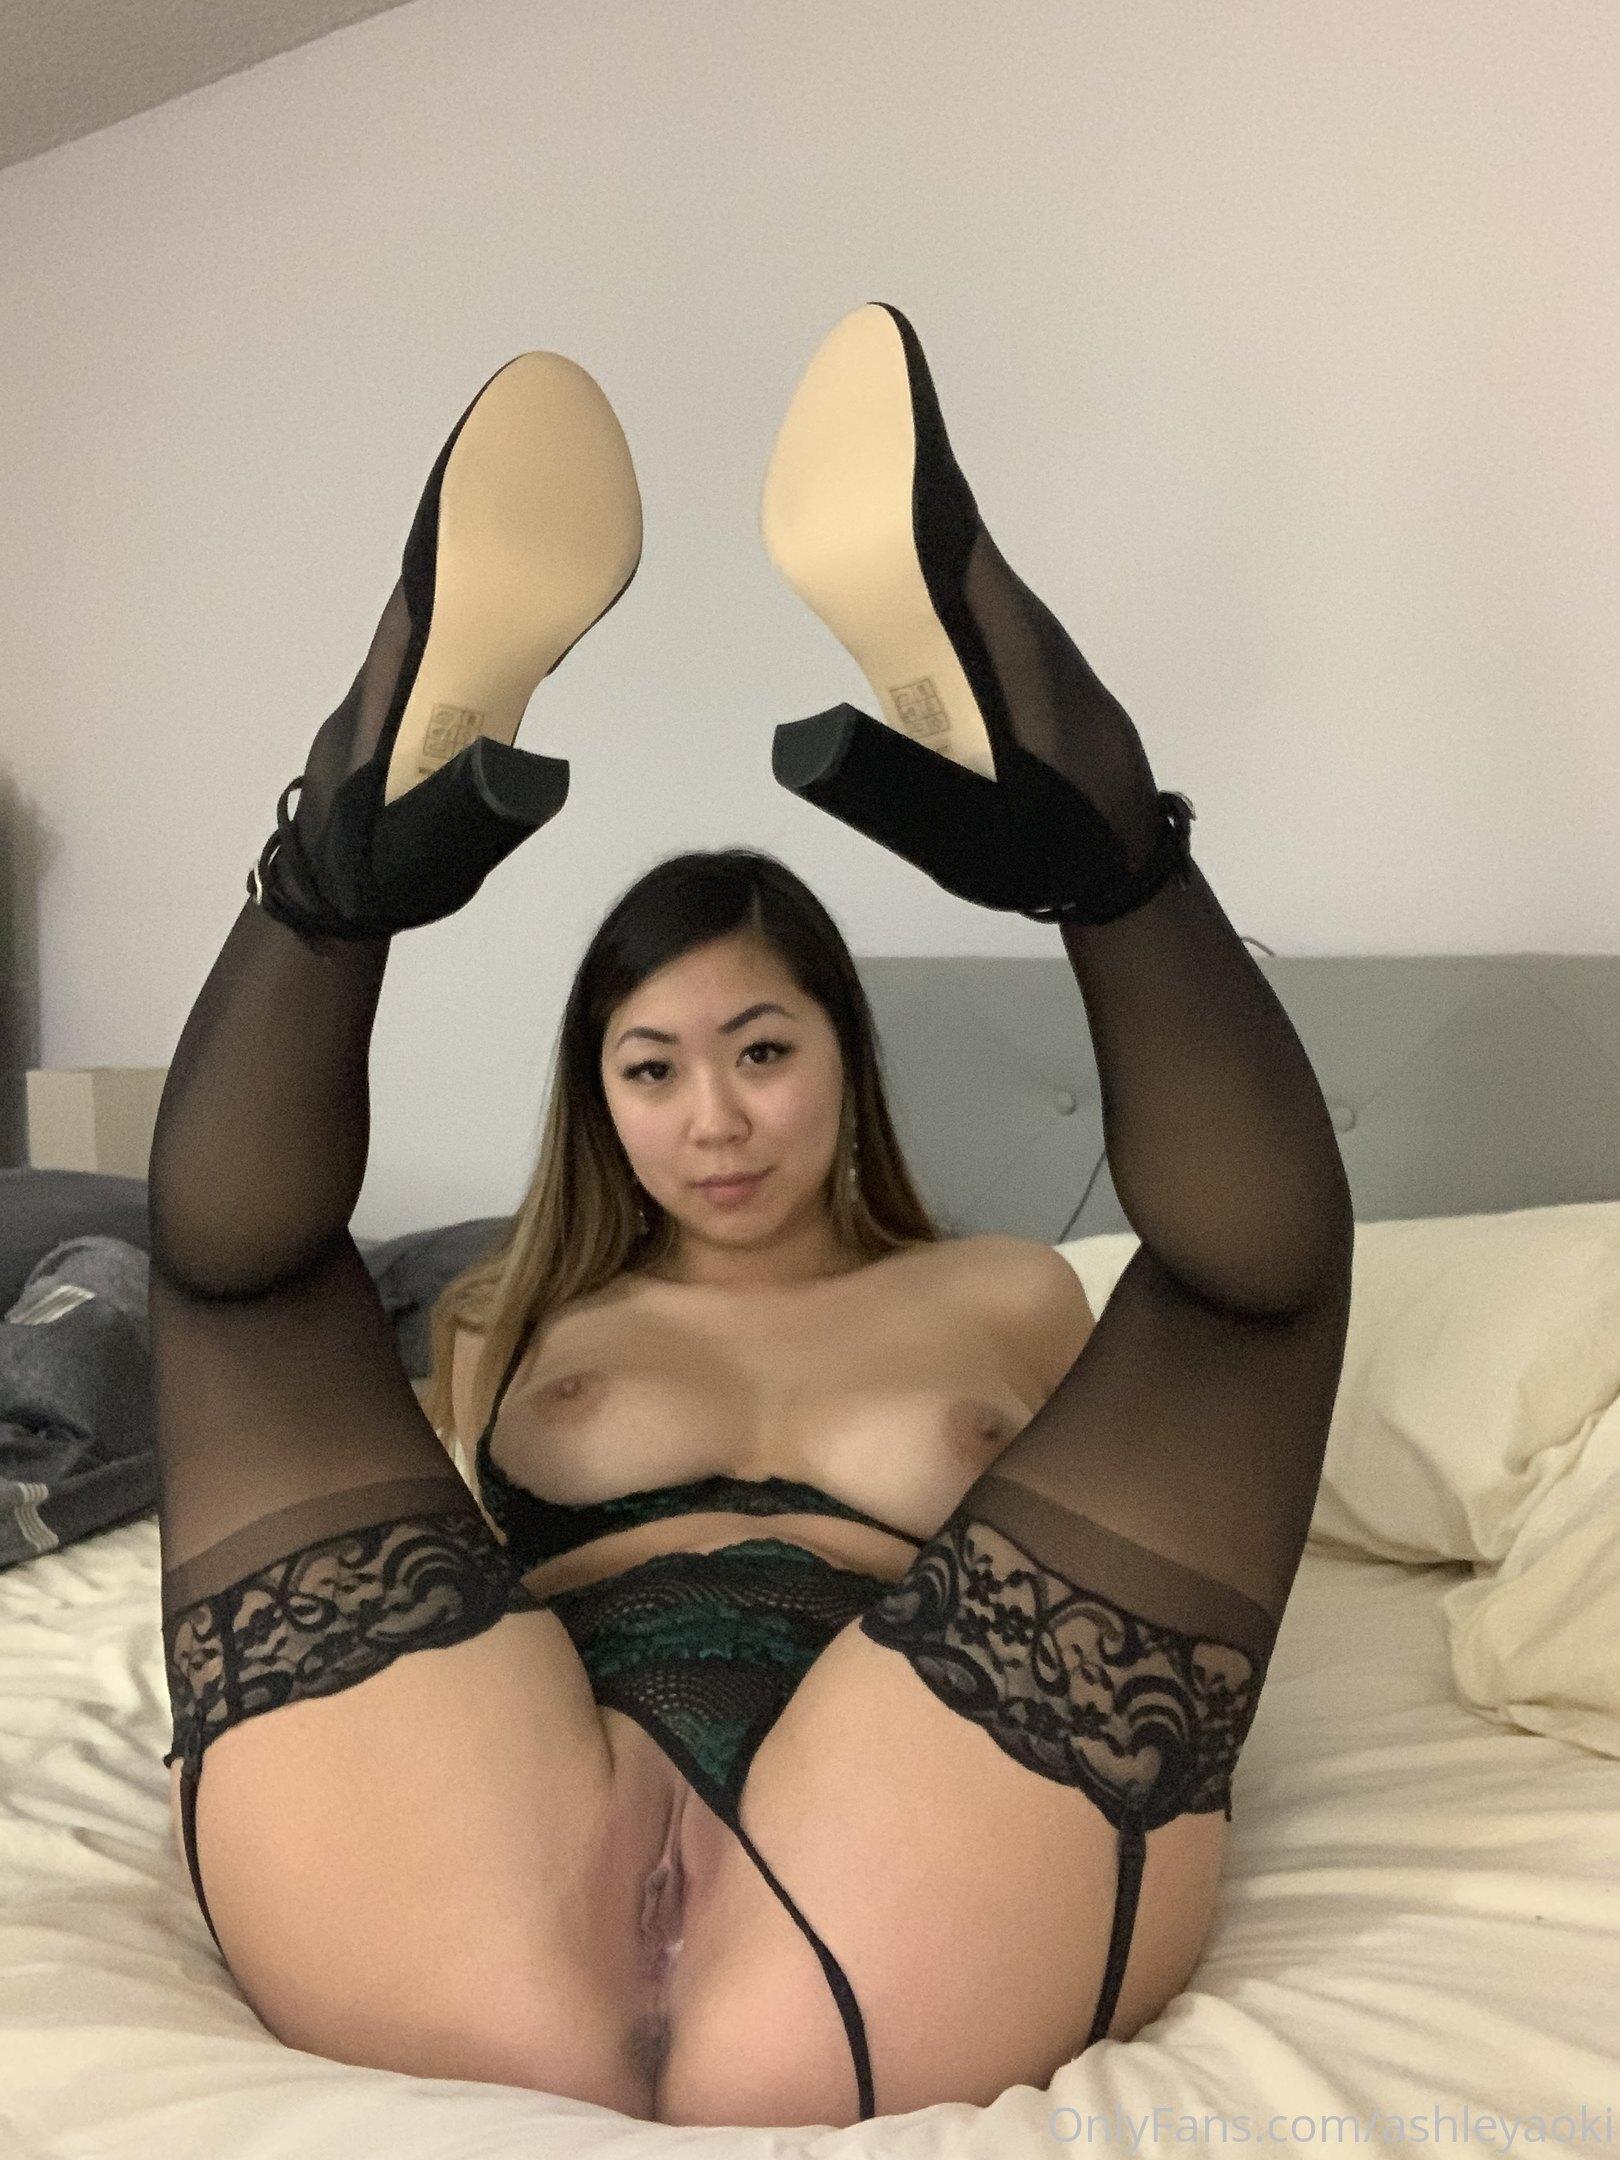 Ashley Aoki, Ashleyaoki, Onlyfans Leaks 0089